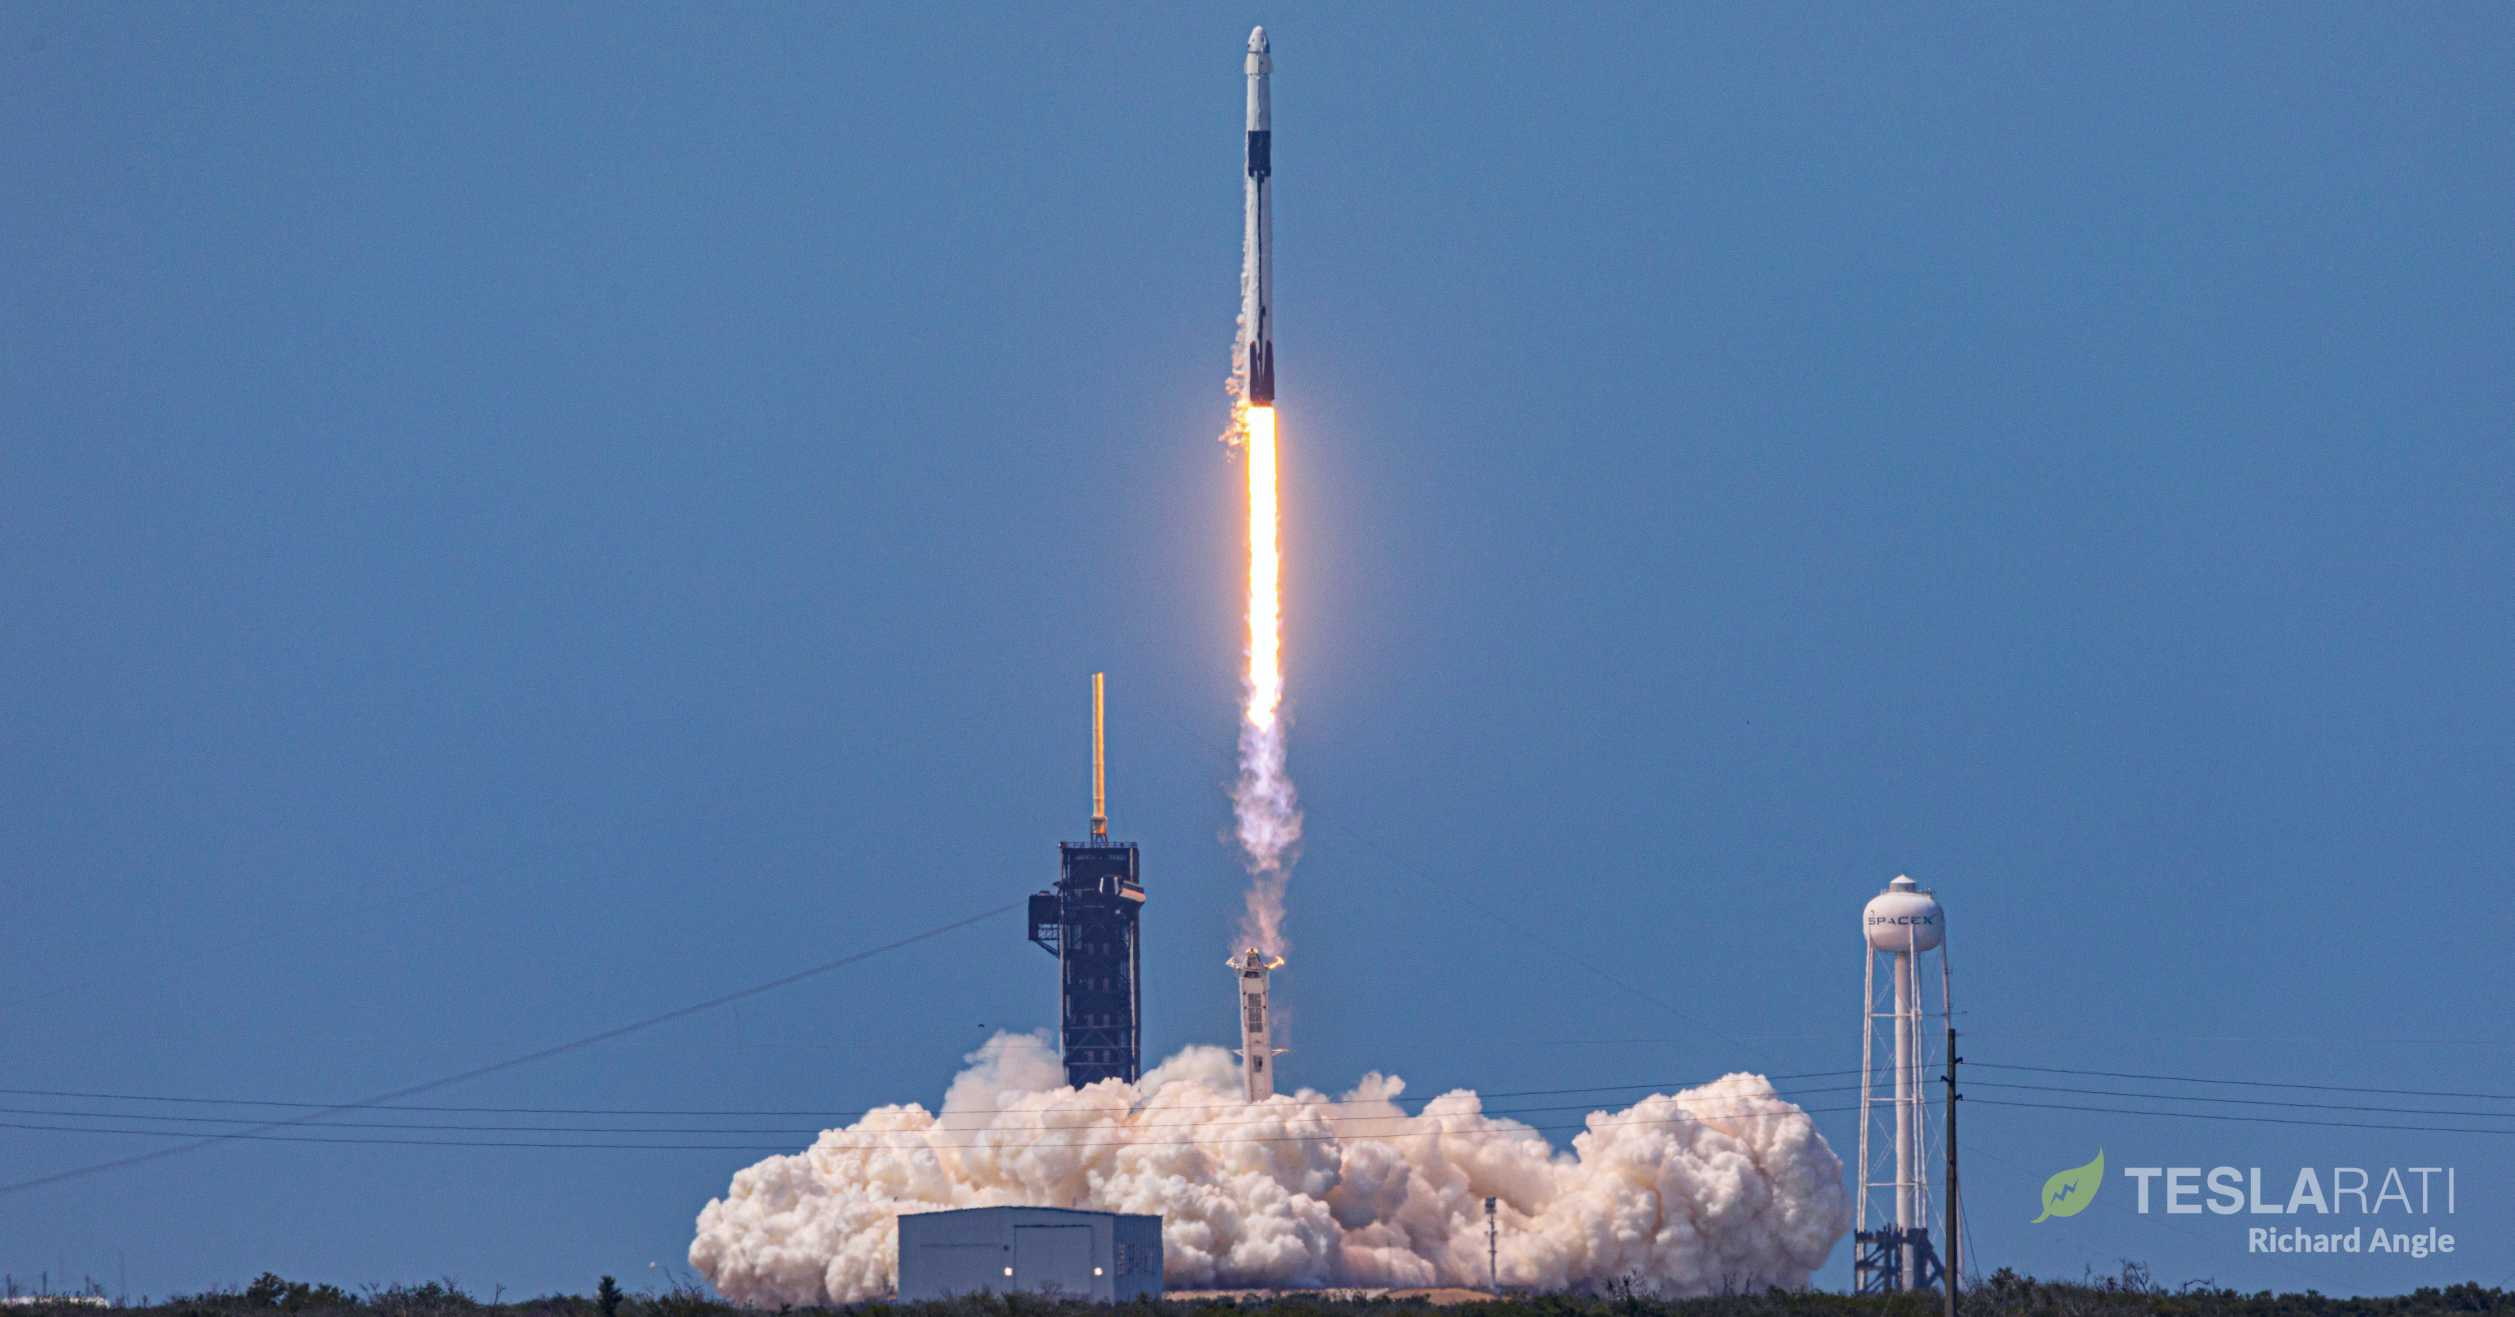 Crew Dragon Demo-2 Falcon 9 B1058 C206 39A launch 053020 (Richard Angle) 1 crop (c)